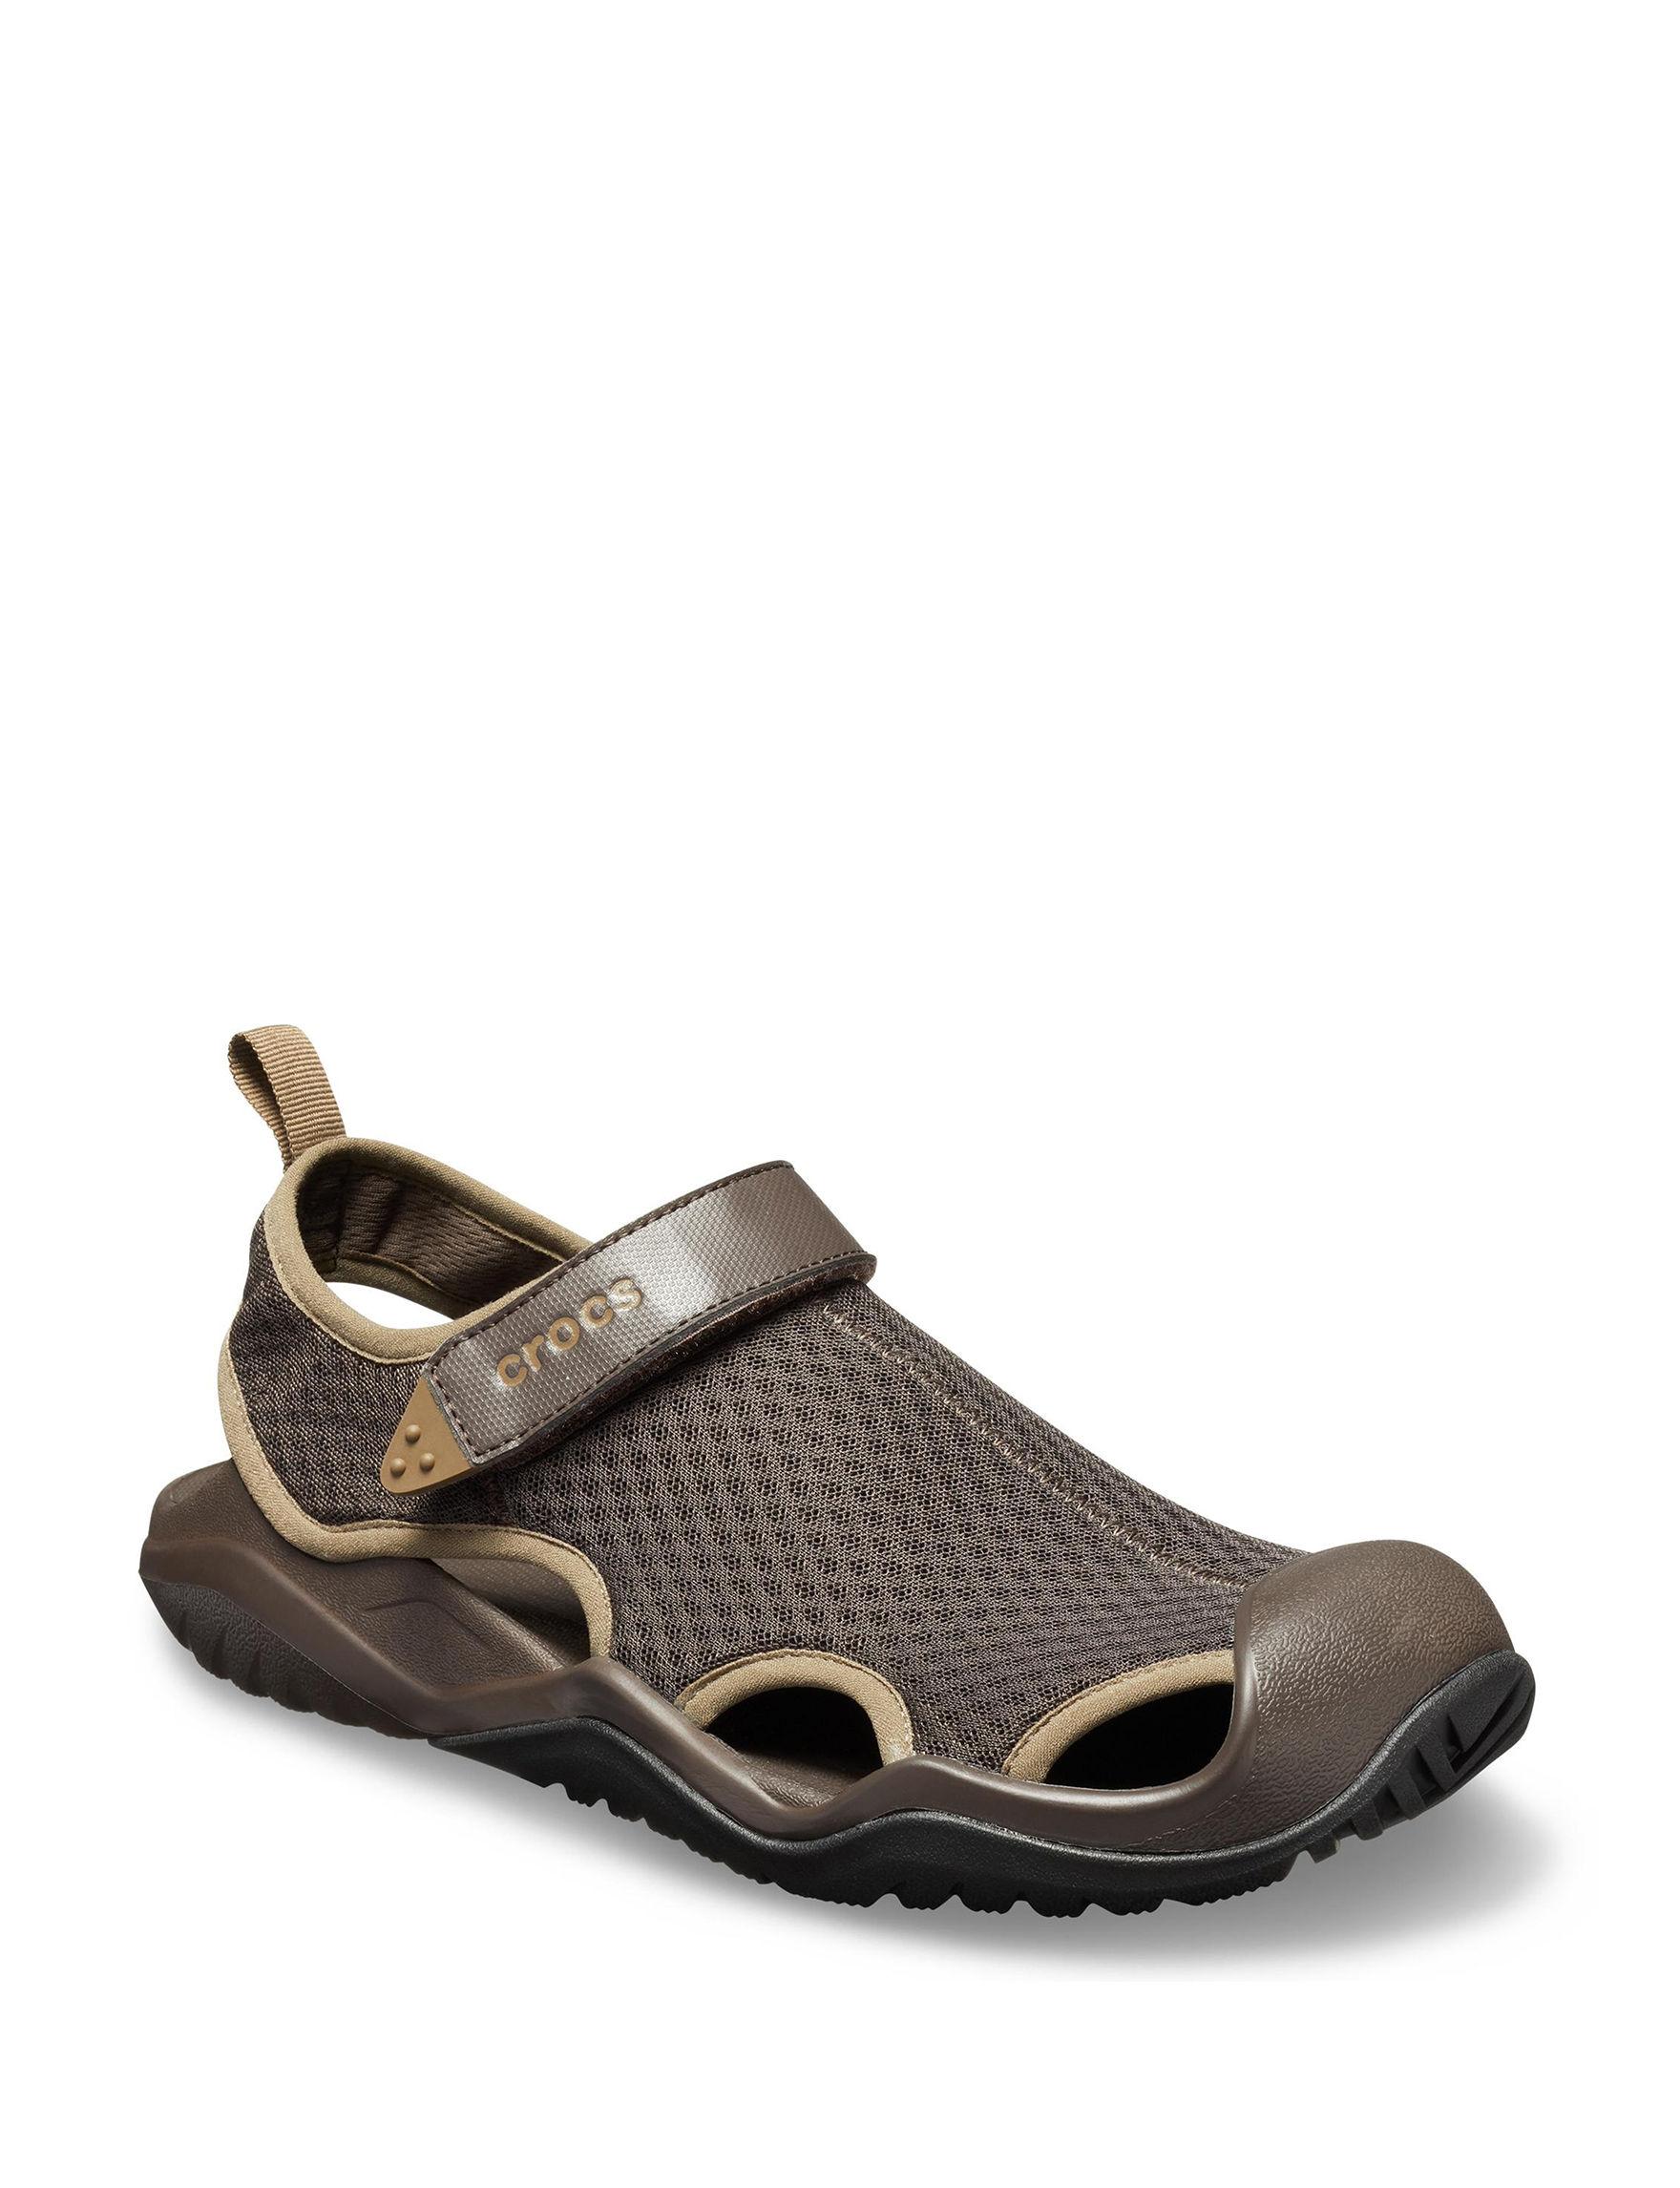 Crocs Dark Brown Sport Sandals